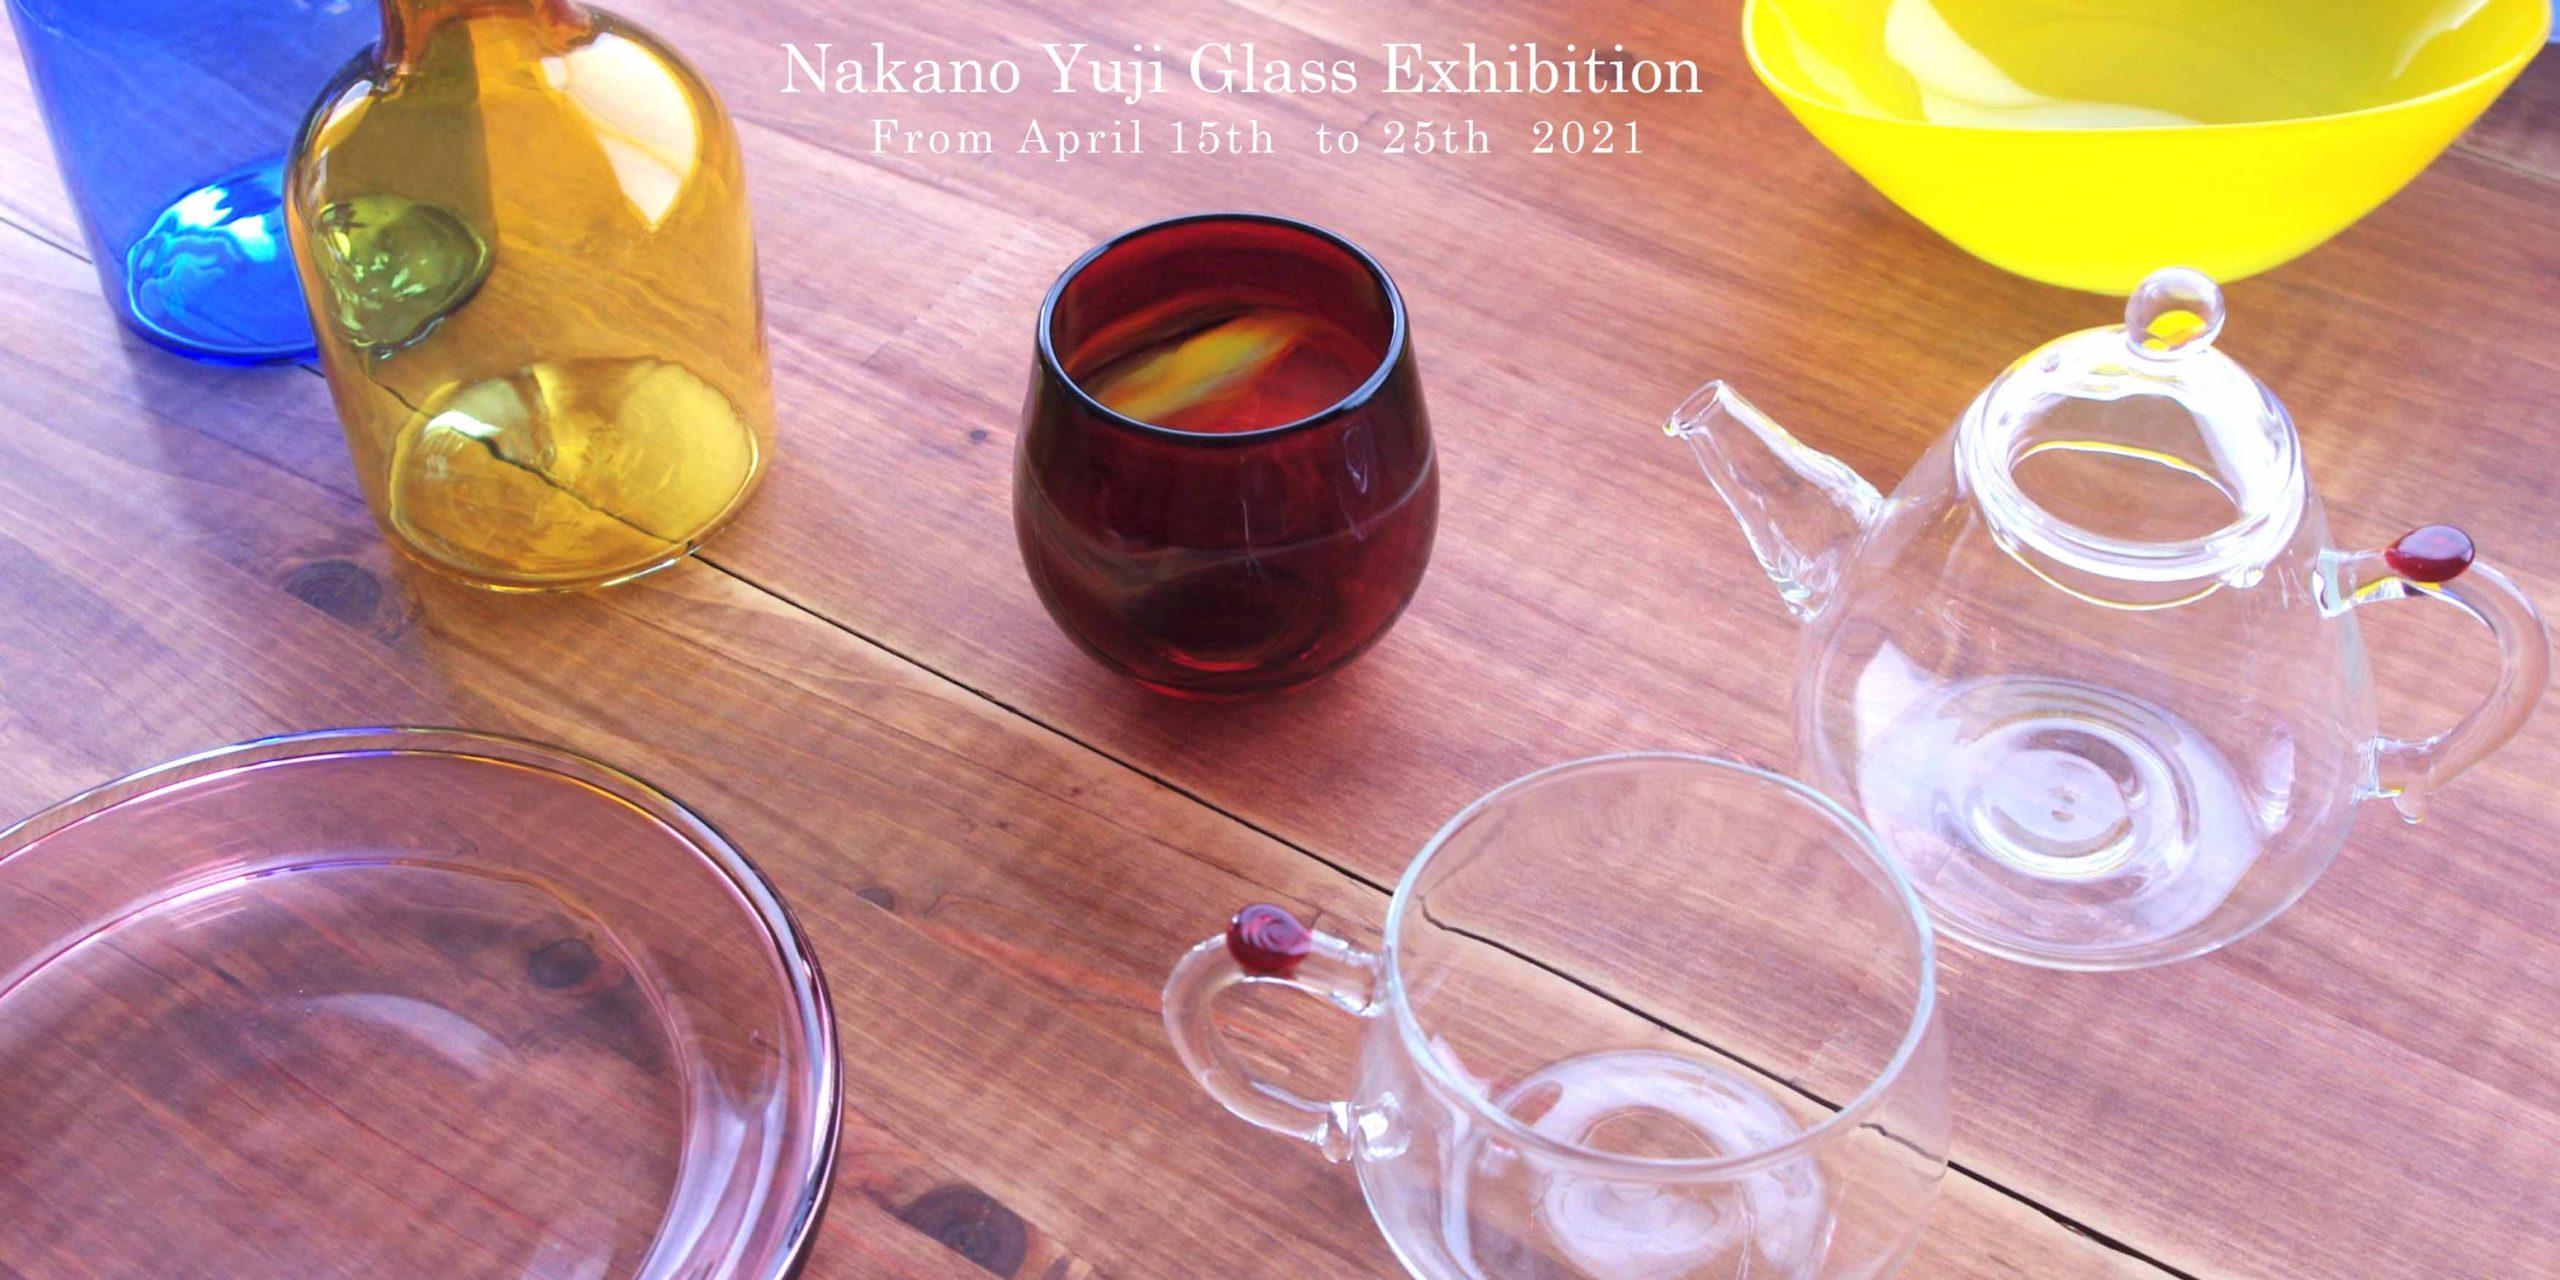 Mamica 陶のギャラリーとカフェ